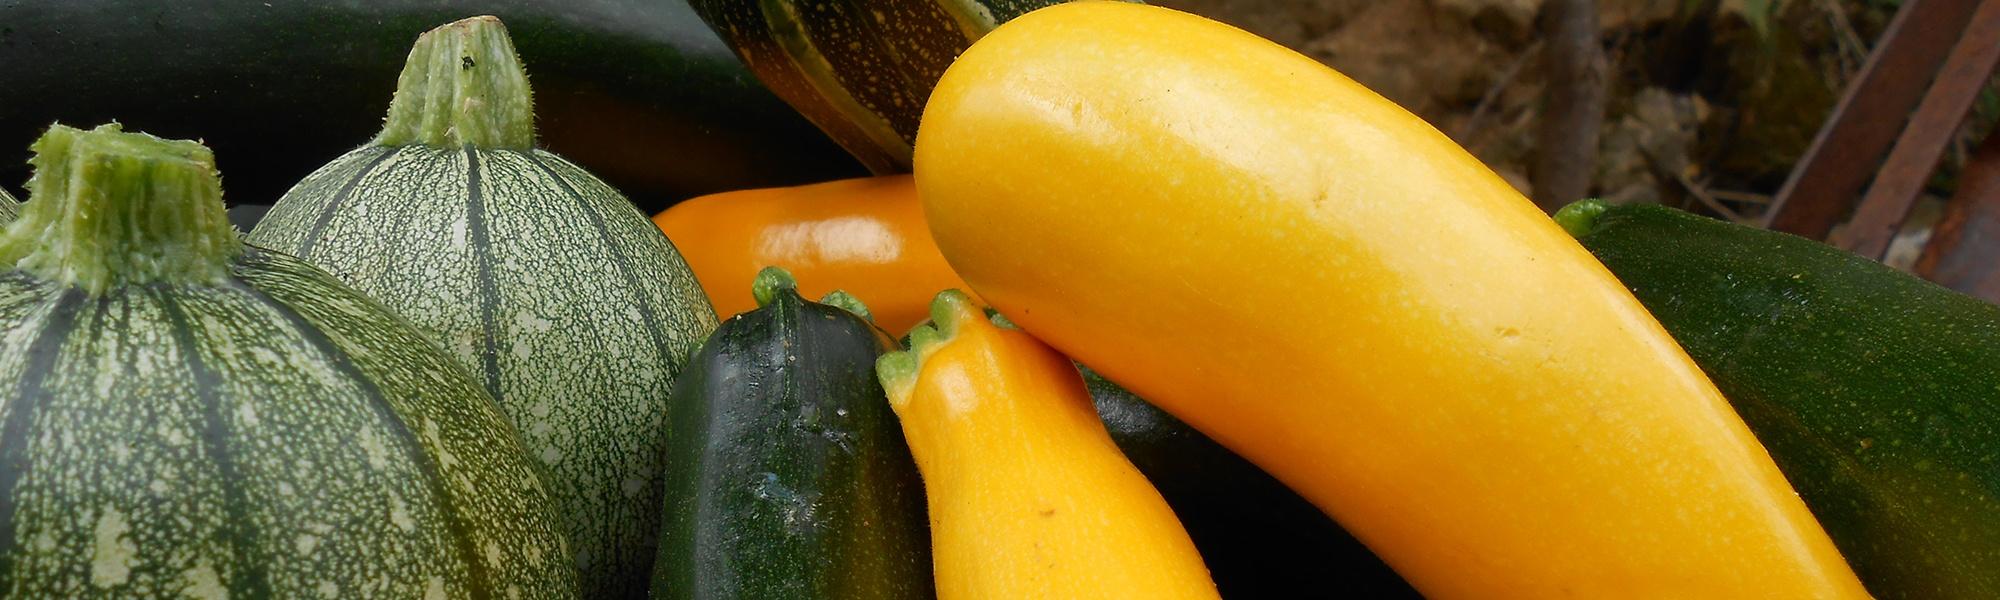 Légumes bio Poitiers